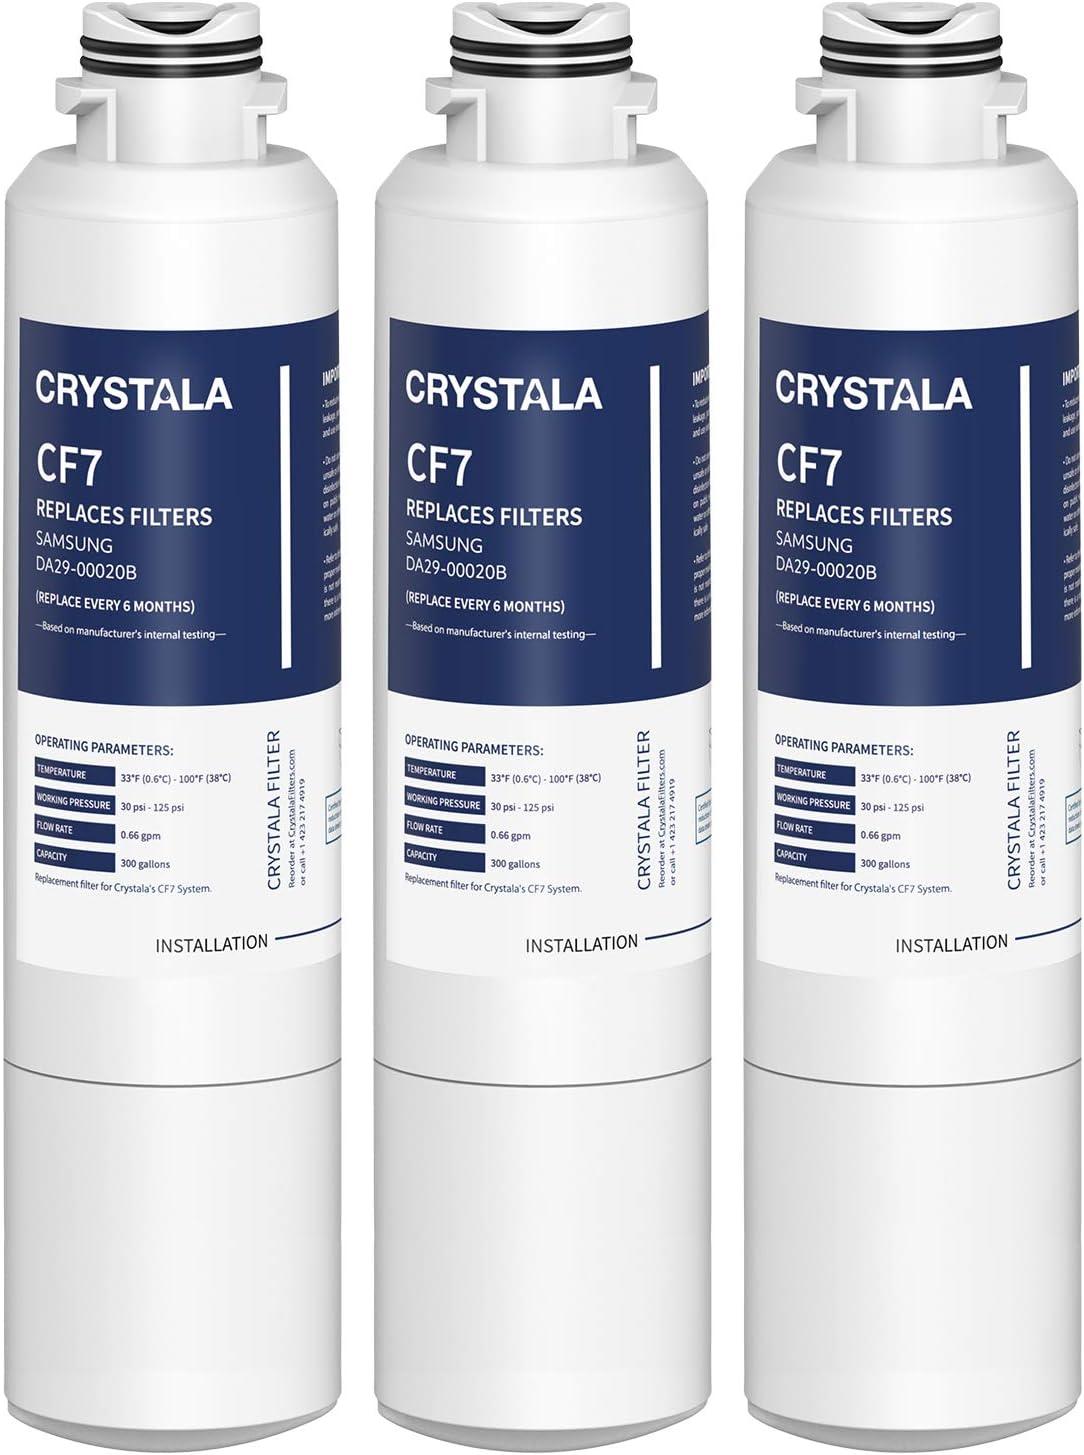 Crystala Filters DA29-00020B Refrigerator Water Filter Replacement for Samsung, CF7 NSF 53&42 Certified Cartridges Compatible with DA29-00020A/B, DA2900020B, HAF-CIN, HAF-CIN/EXP, 46-9101 - 3 Packs